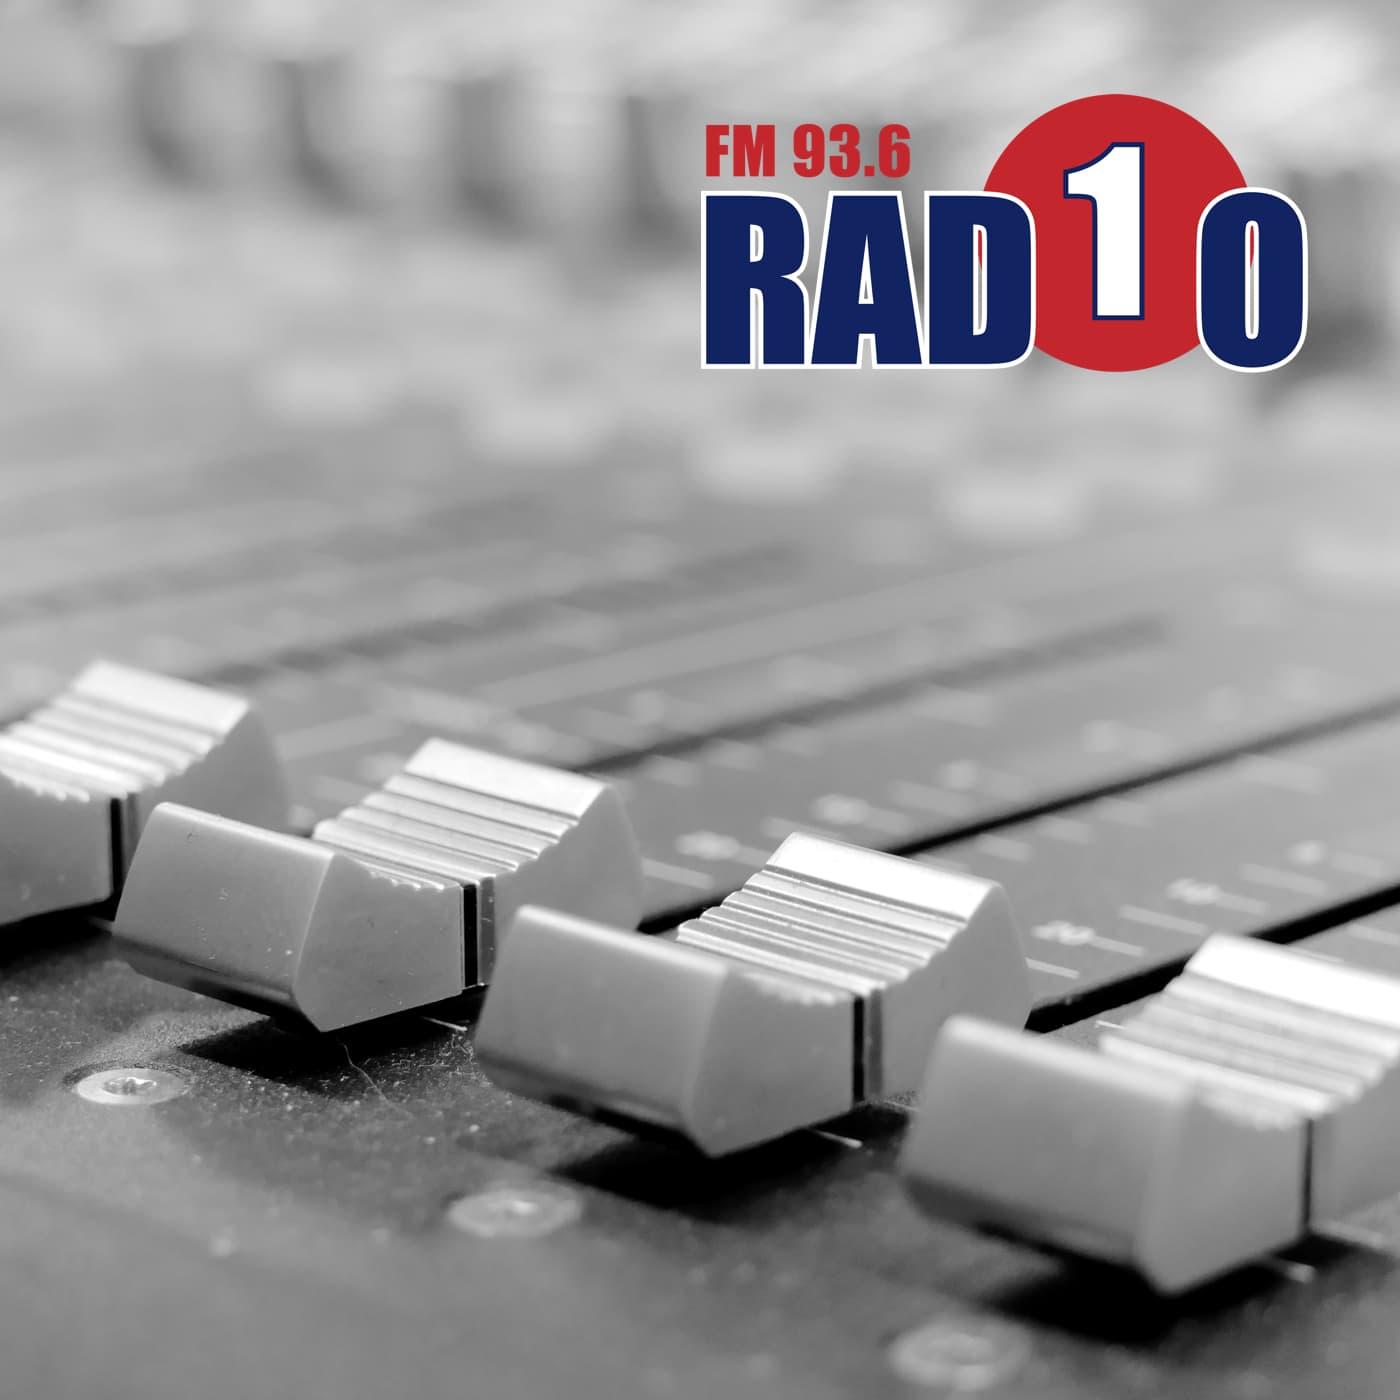 Radio 1 - In Vino Veritas